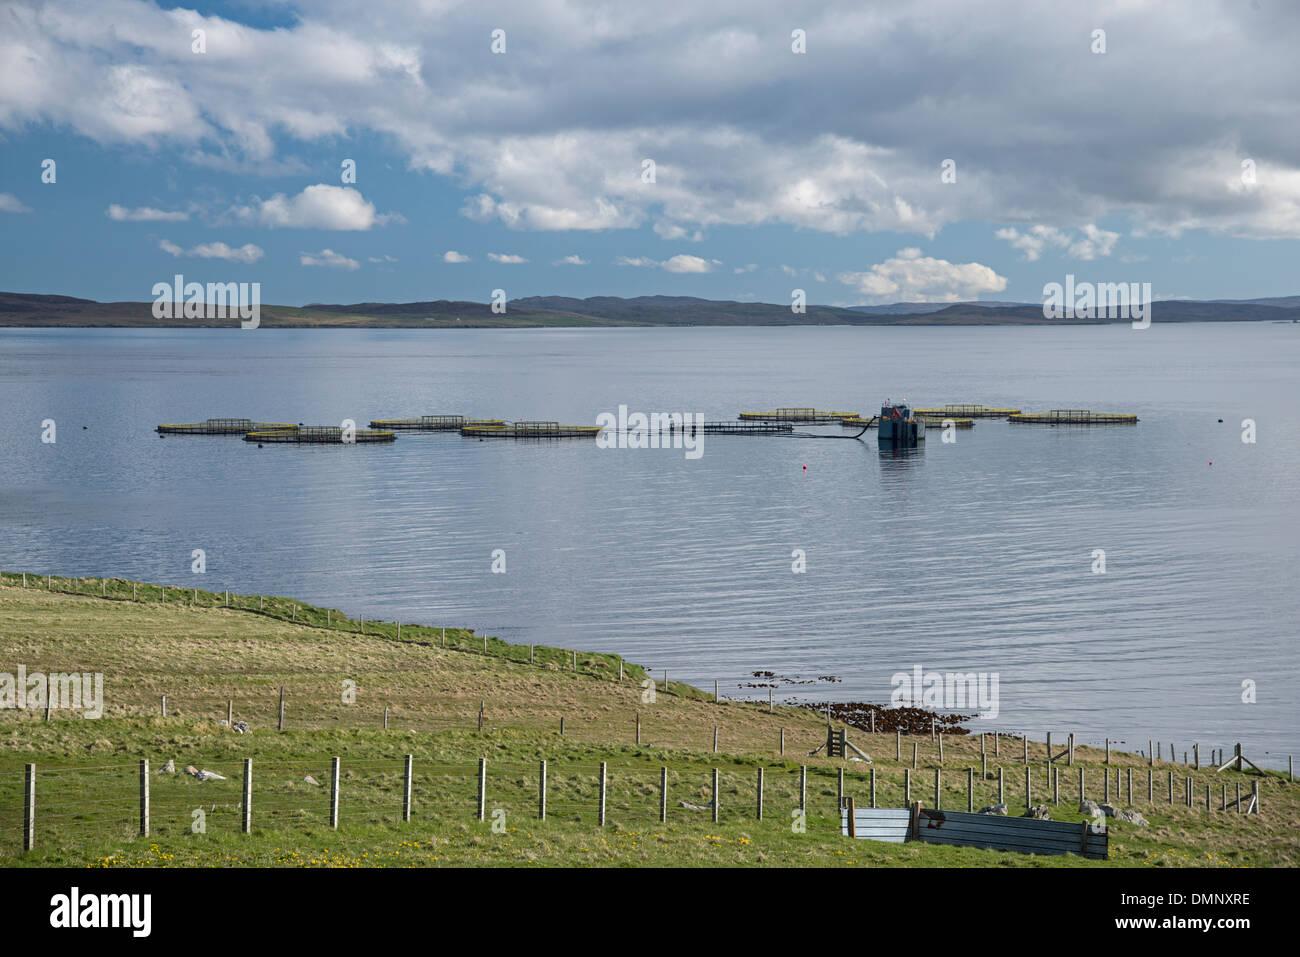 Salmon Farm, Unst, Shetland, Scotland - Stock Image